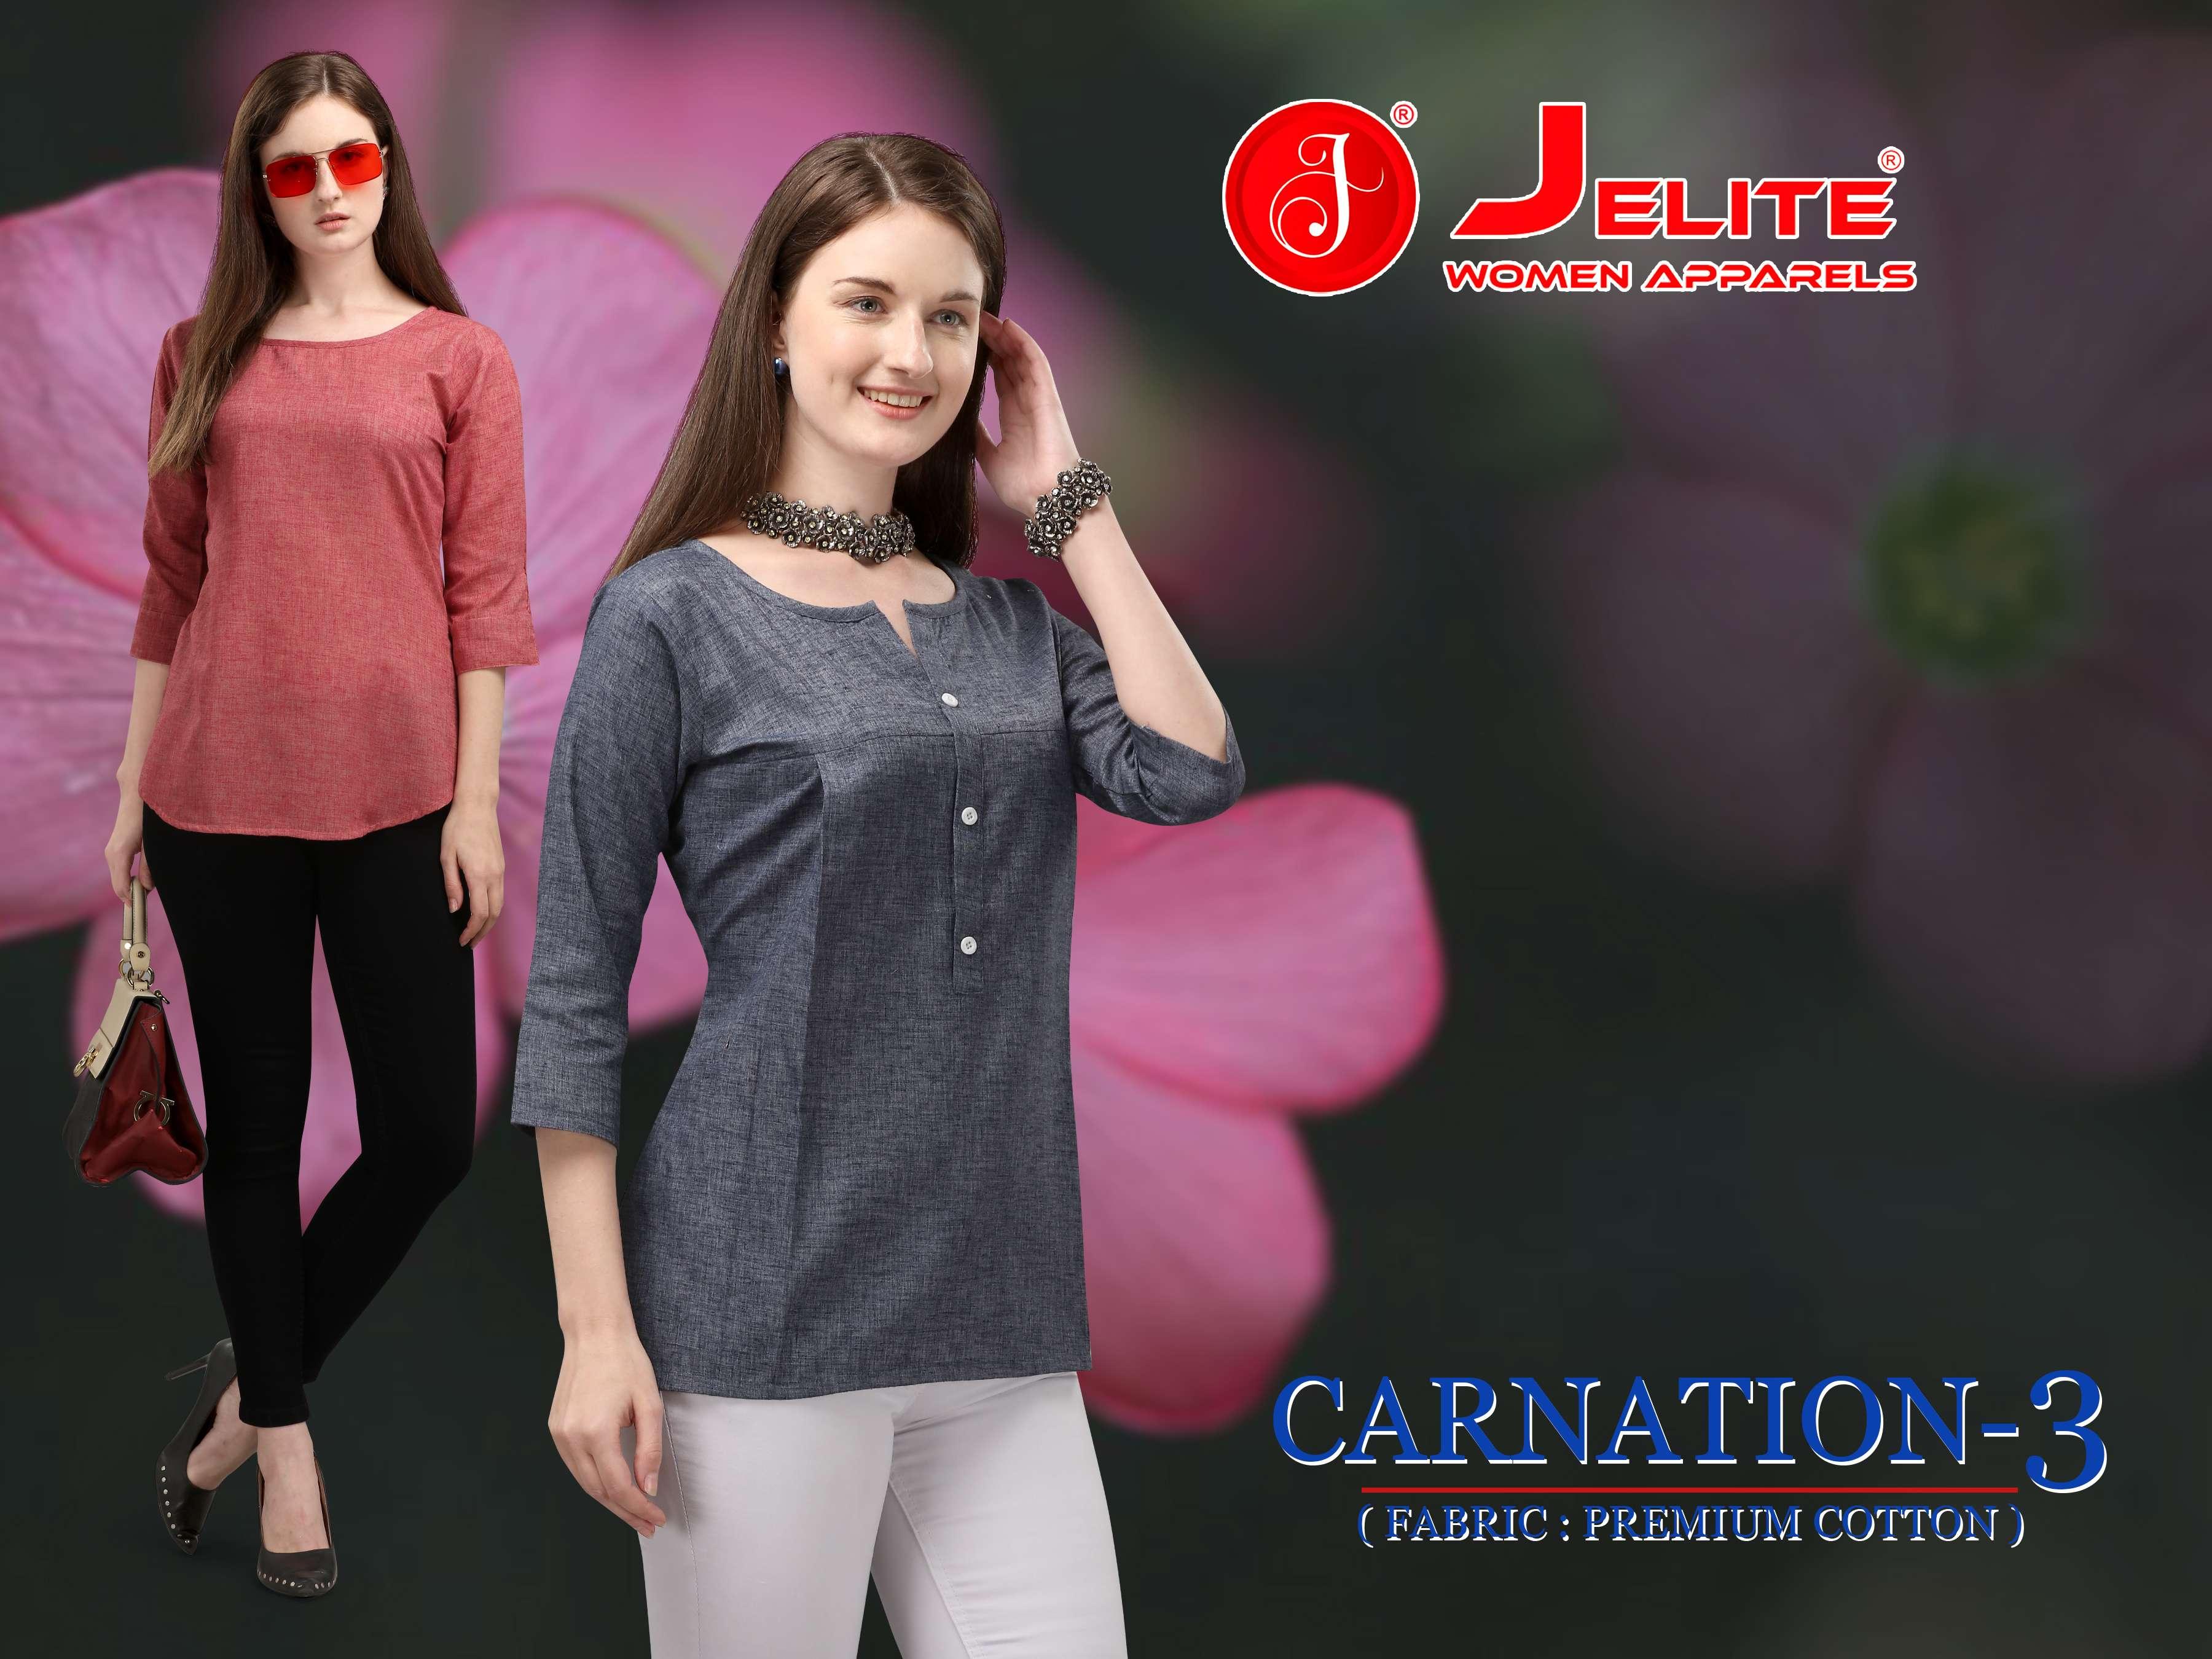 Jelite Carnation vol 3